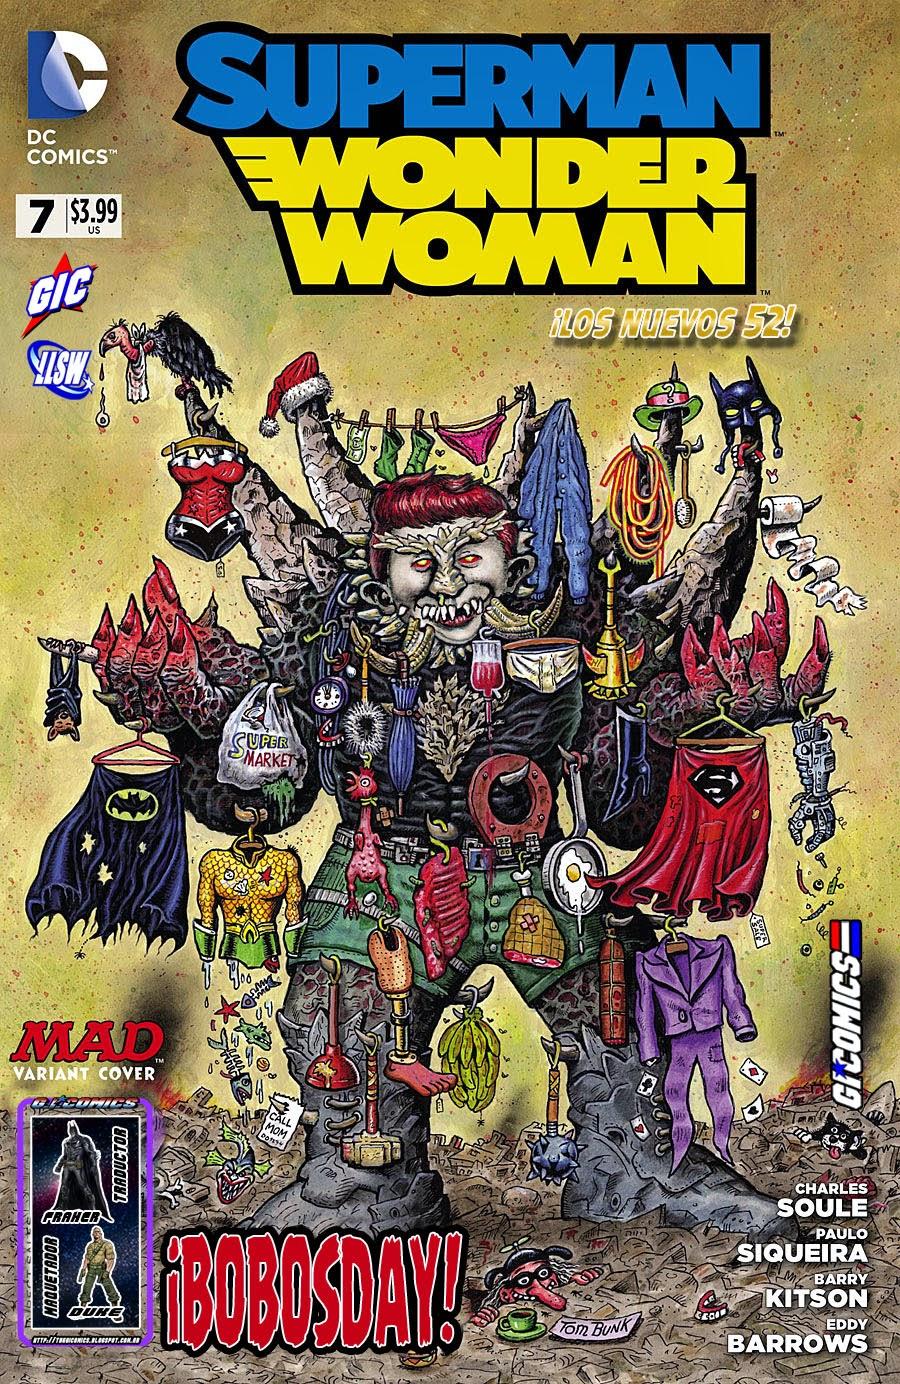 http://www.mediafire.com/download/56r2evr3k704fue/SUPERMAN-WONDER+WOMAN+07+GI+COMICS-LLSW%28Fraher-Duke%29.cbr